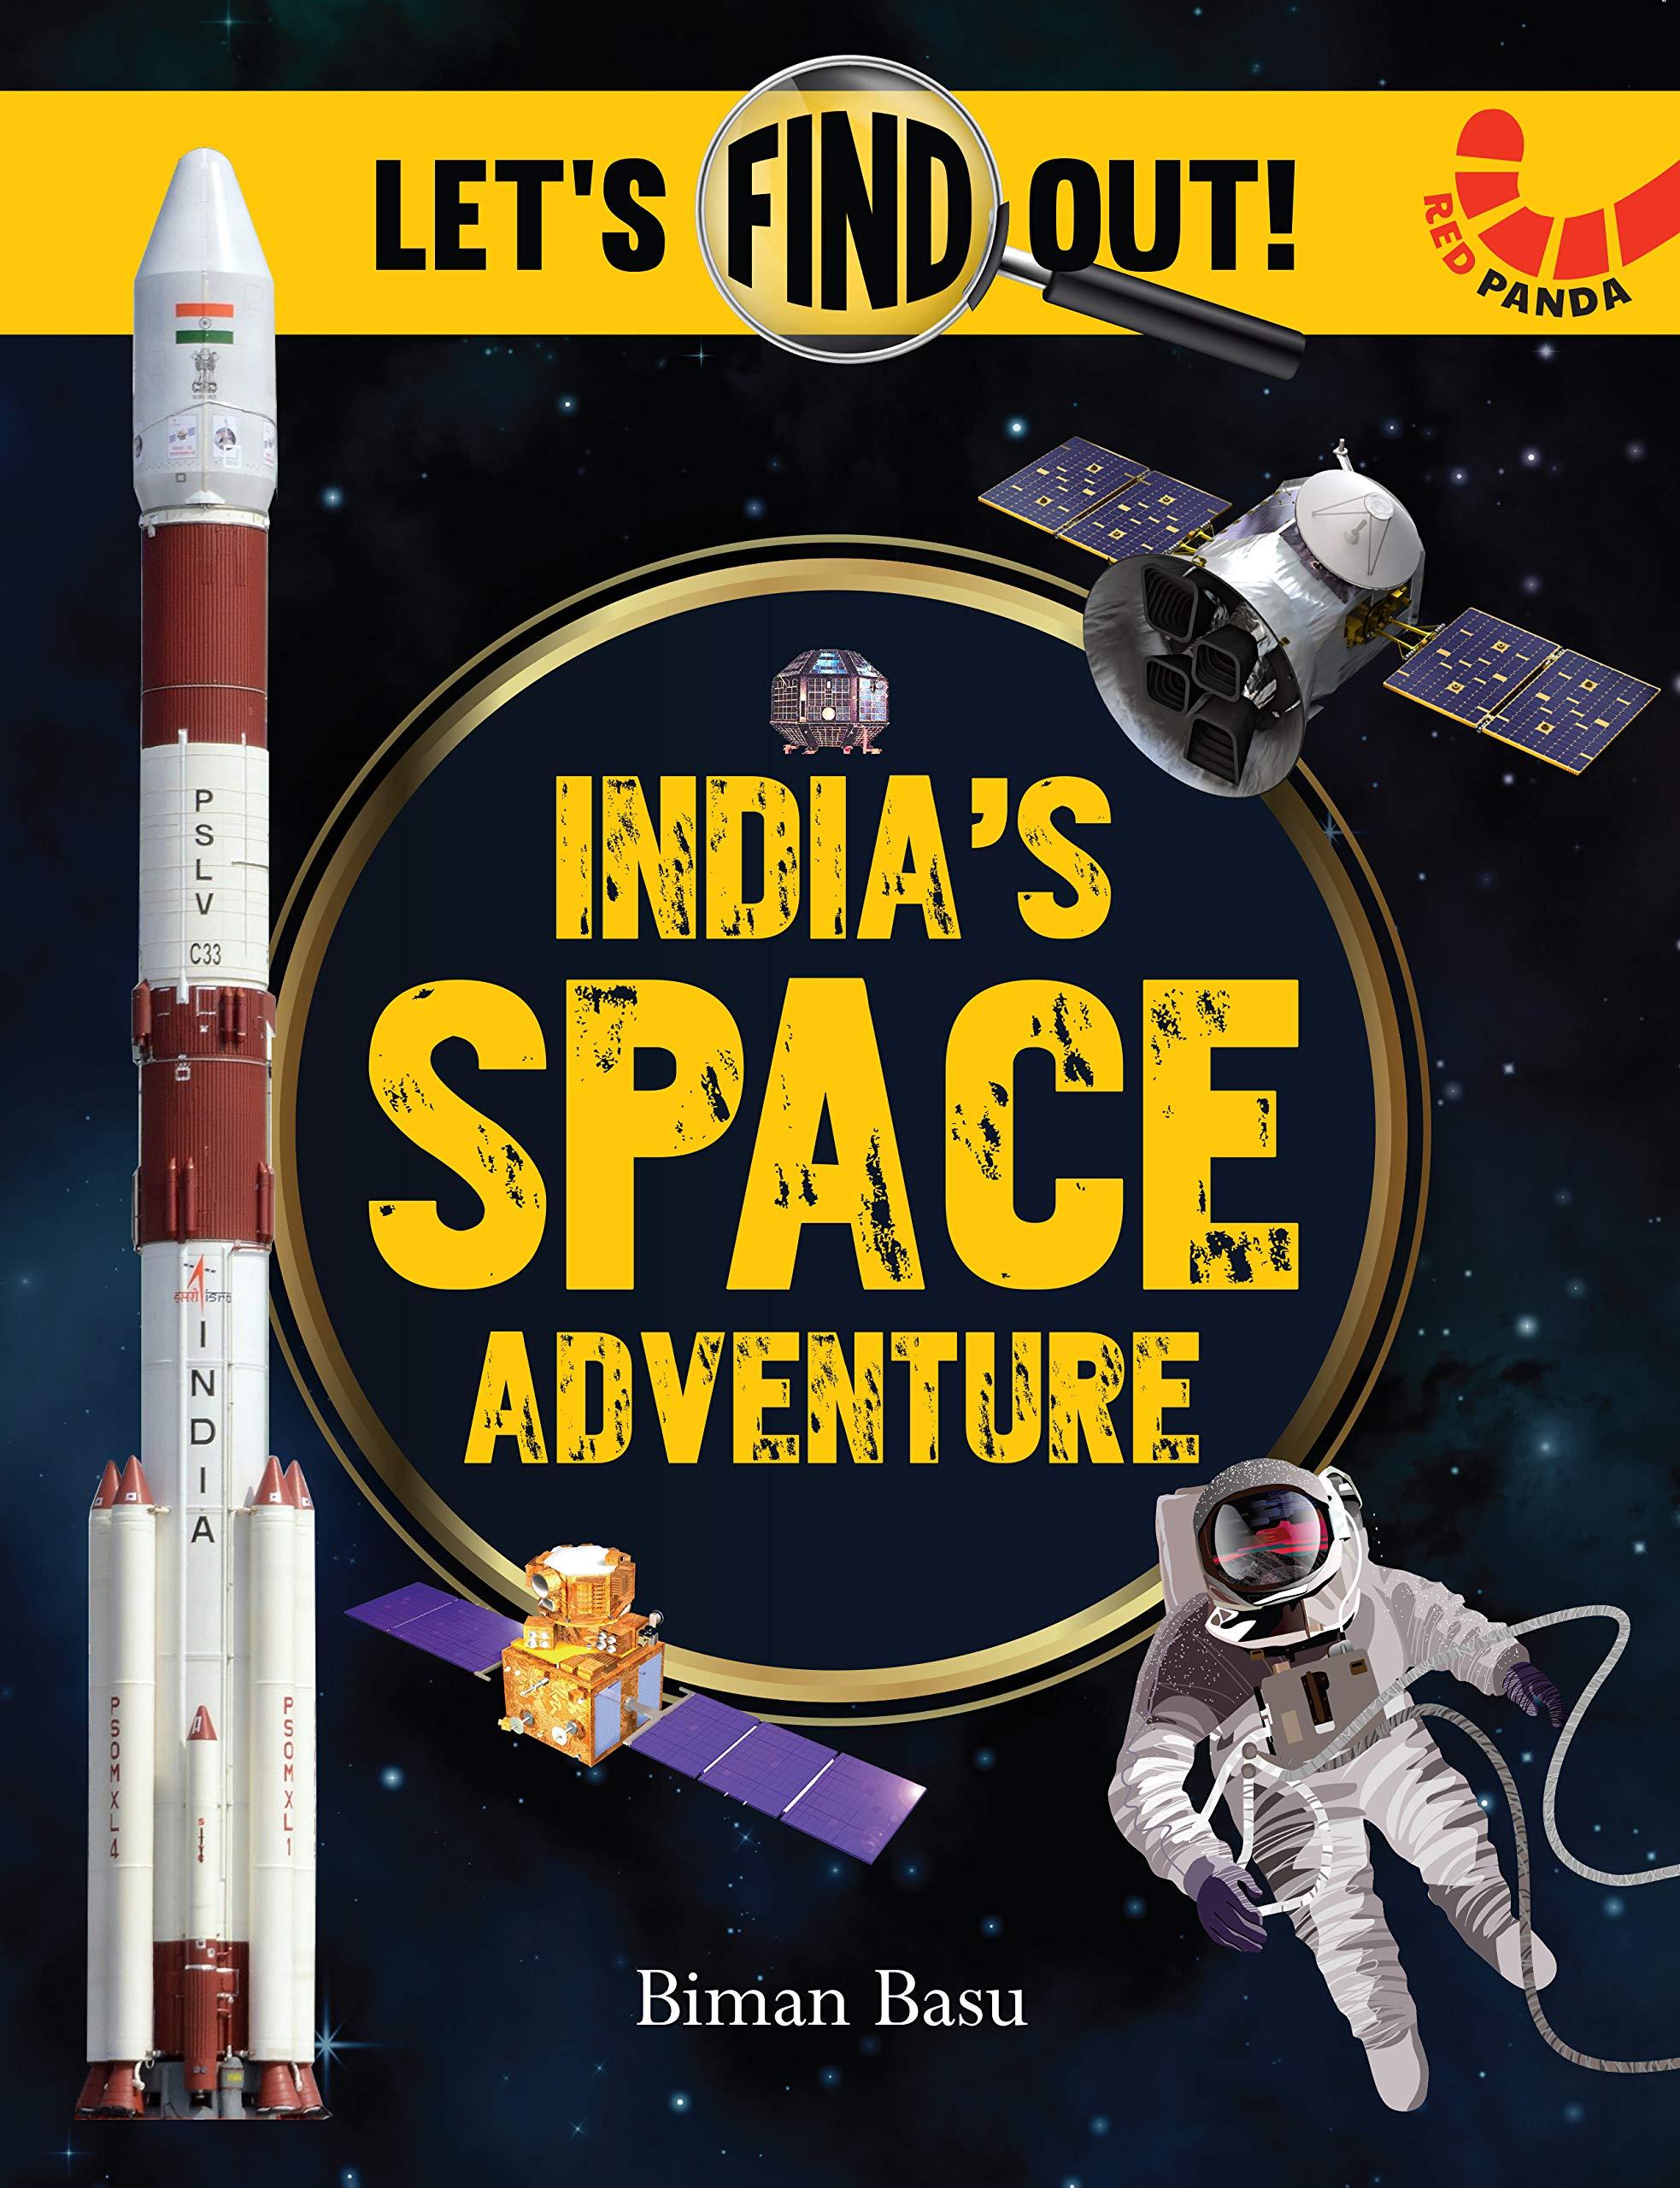 INDIA'S SPACE ADVENTURE BIMAN BASU